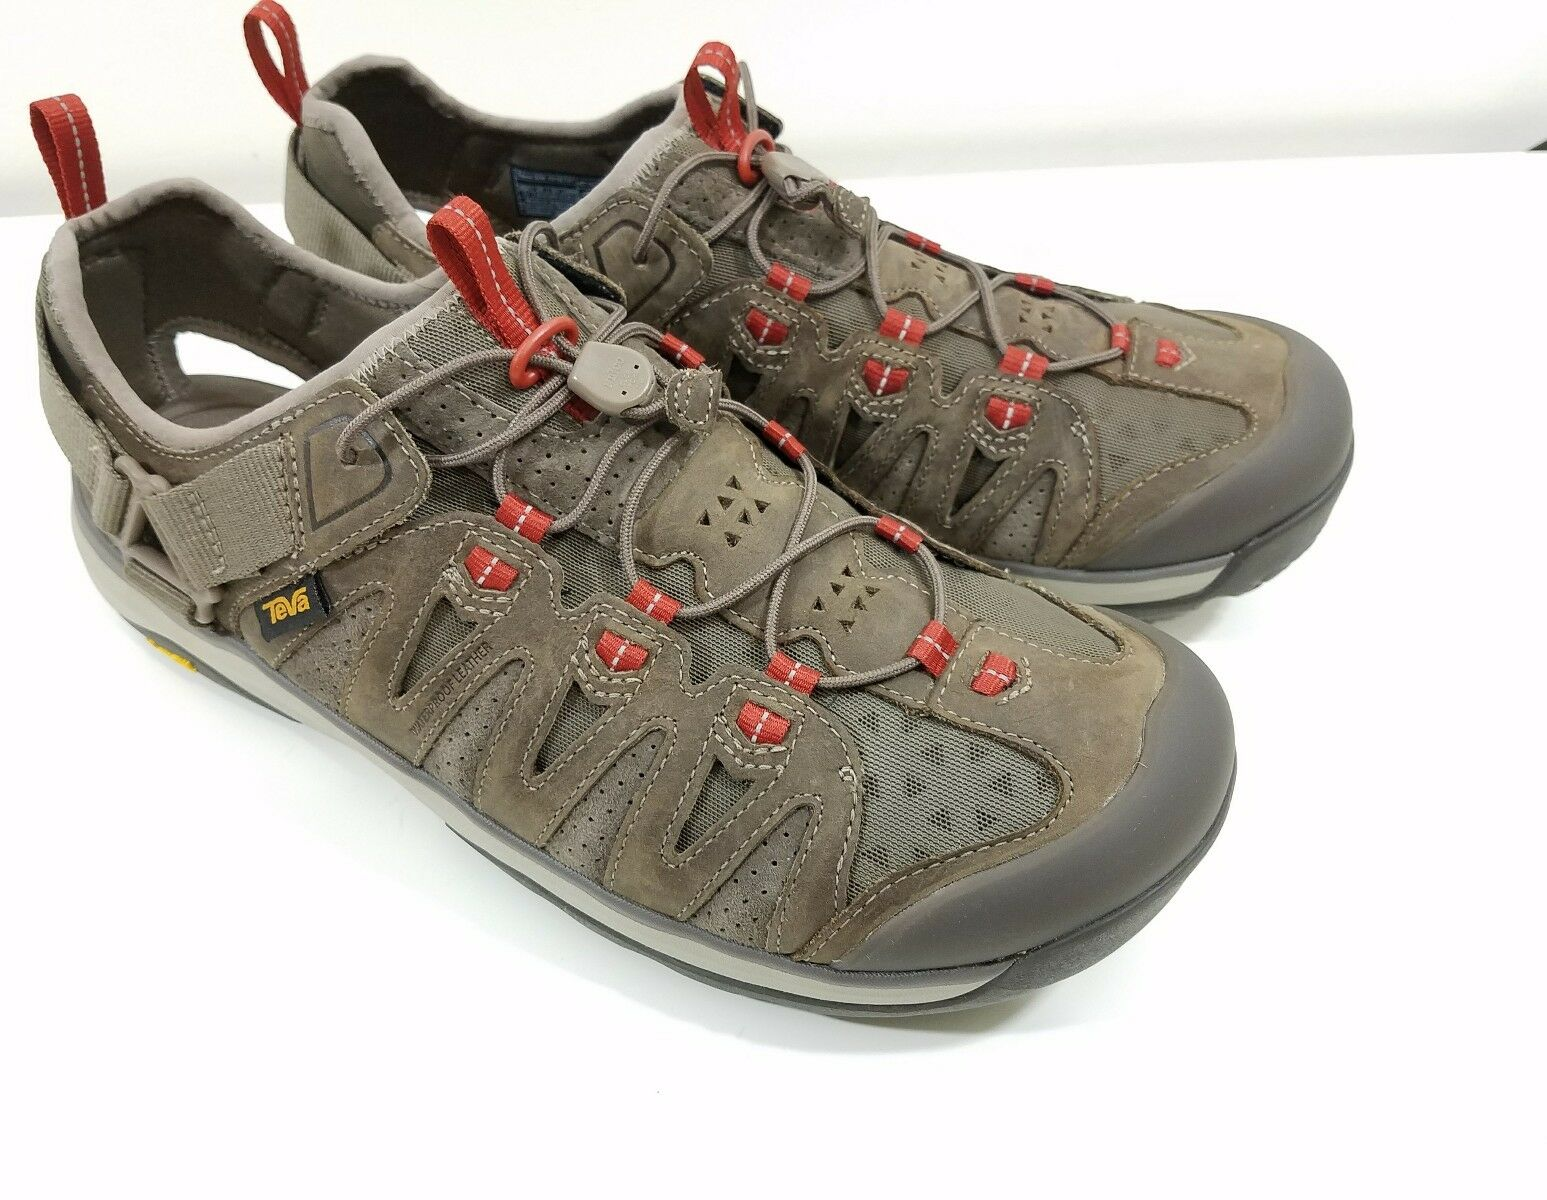 Teva Terra Float Active Lace Men's Size 11.5 shoes Water Sport Sandal Hike Walnut